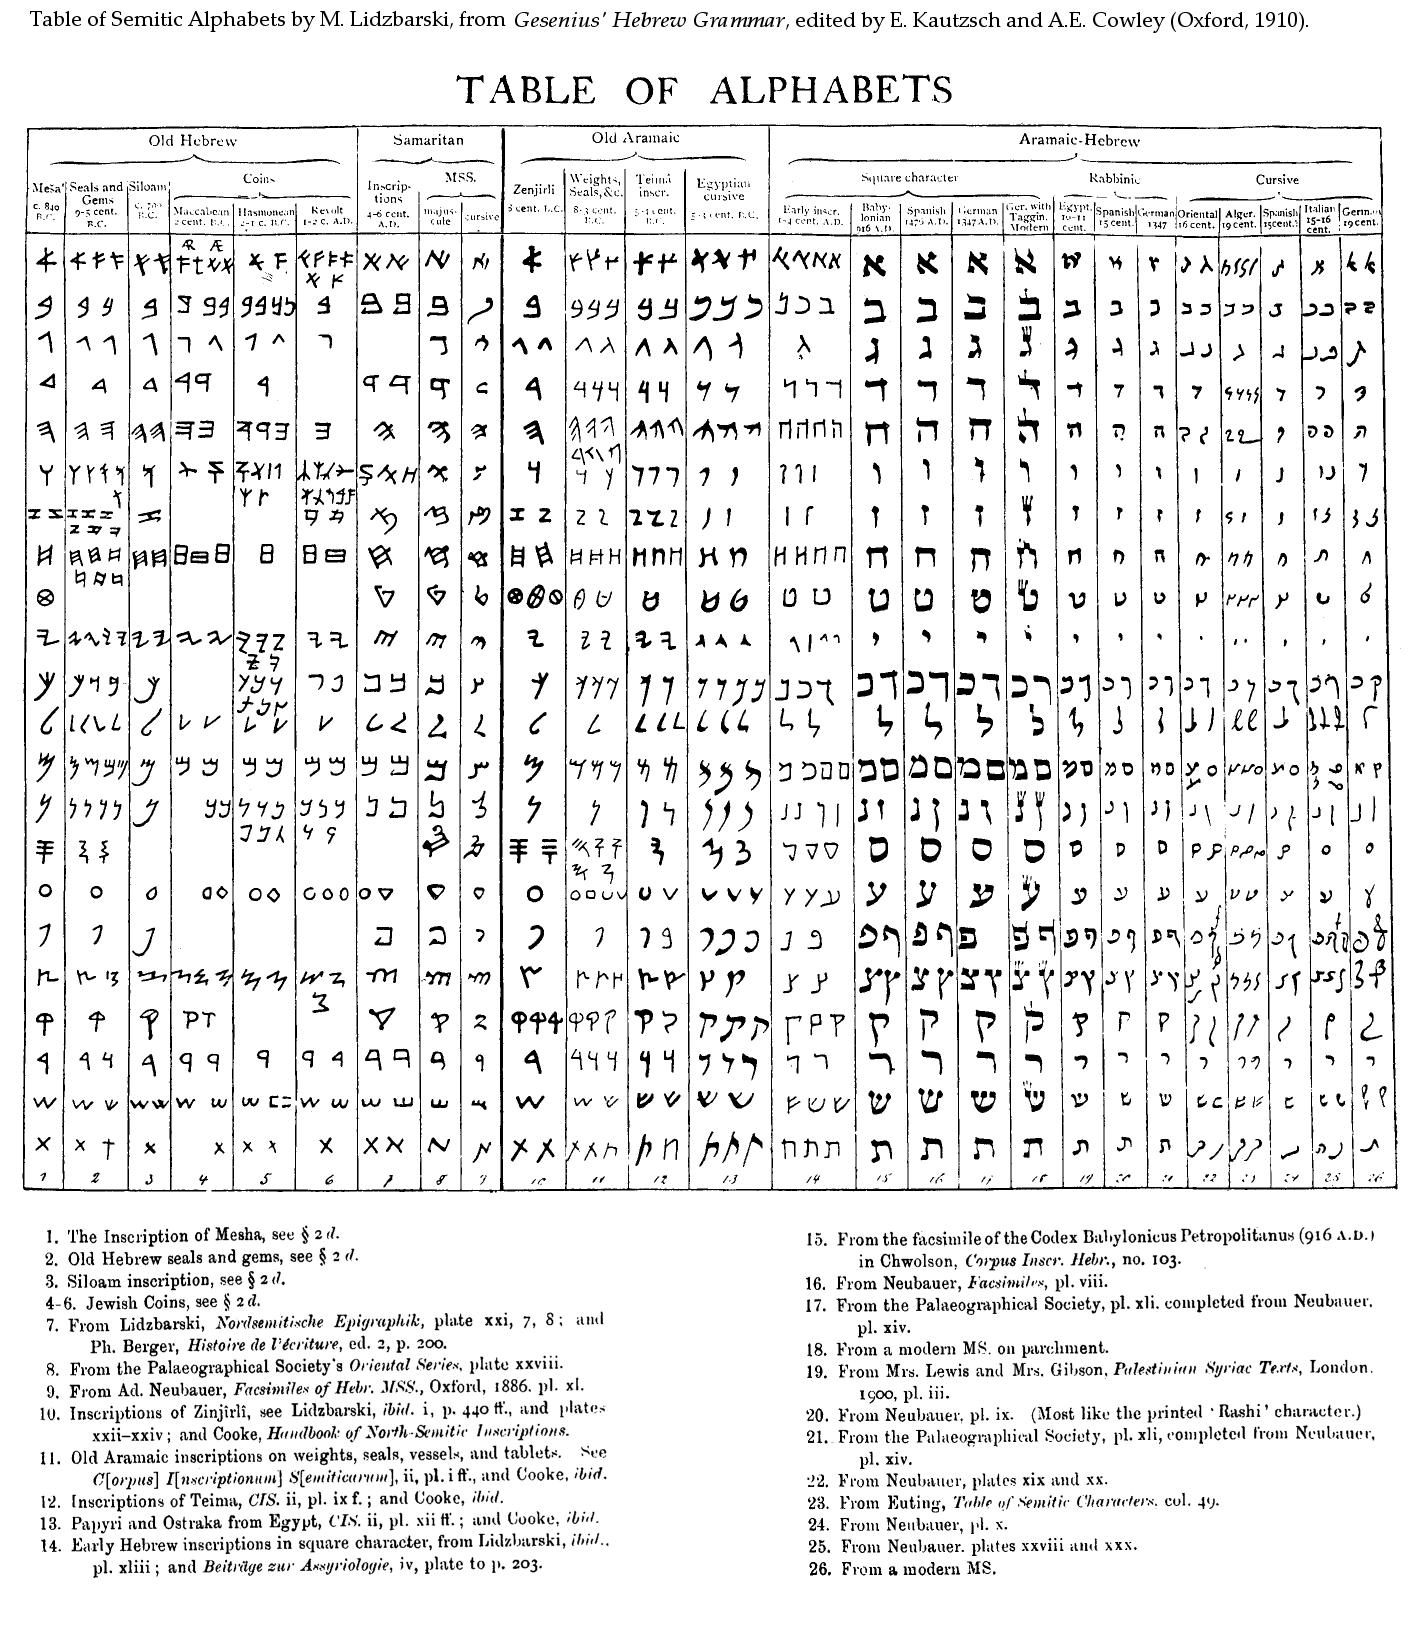 greek hebrew comparison essay Hebrew vs greek religion  xenophanes critique of greek religion essay xenophanes' critique of greek religion in this paper, i will show how.